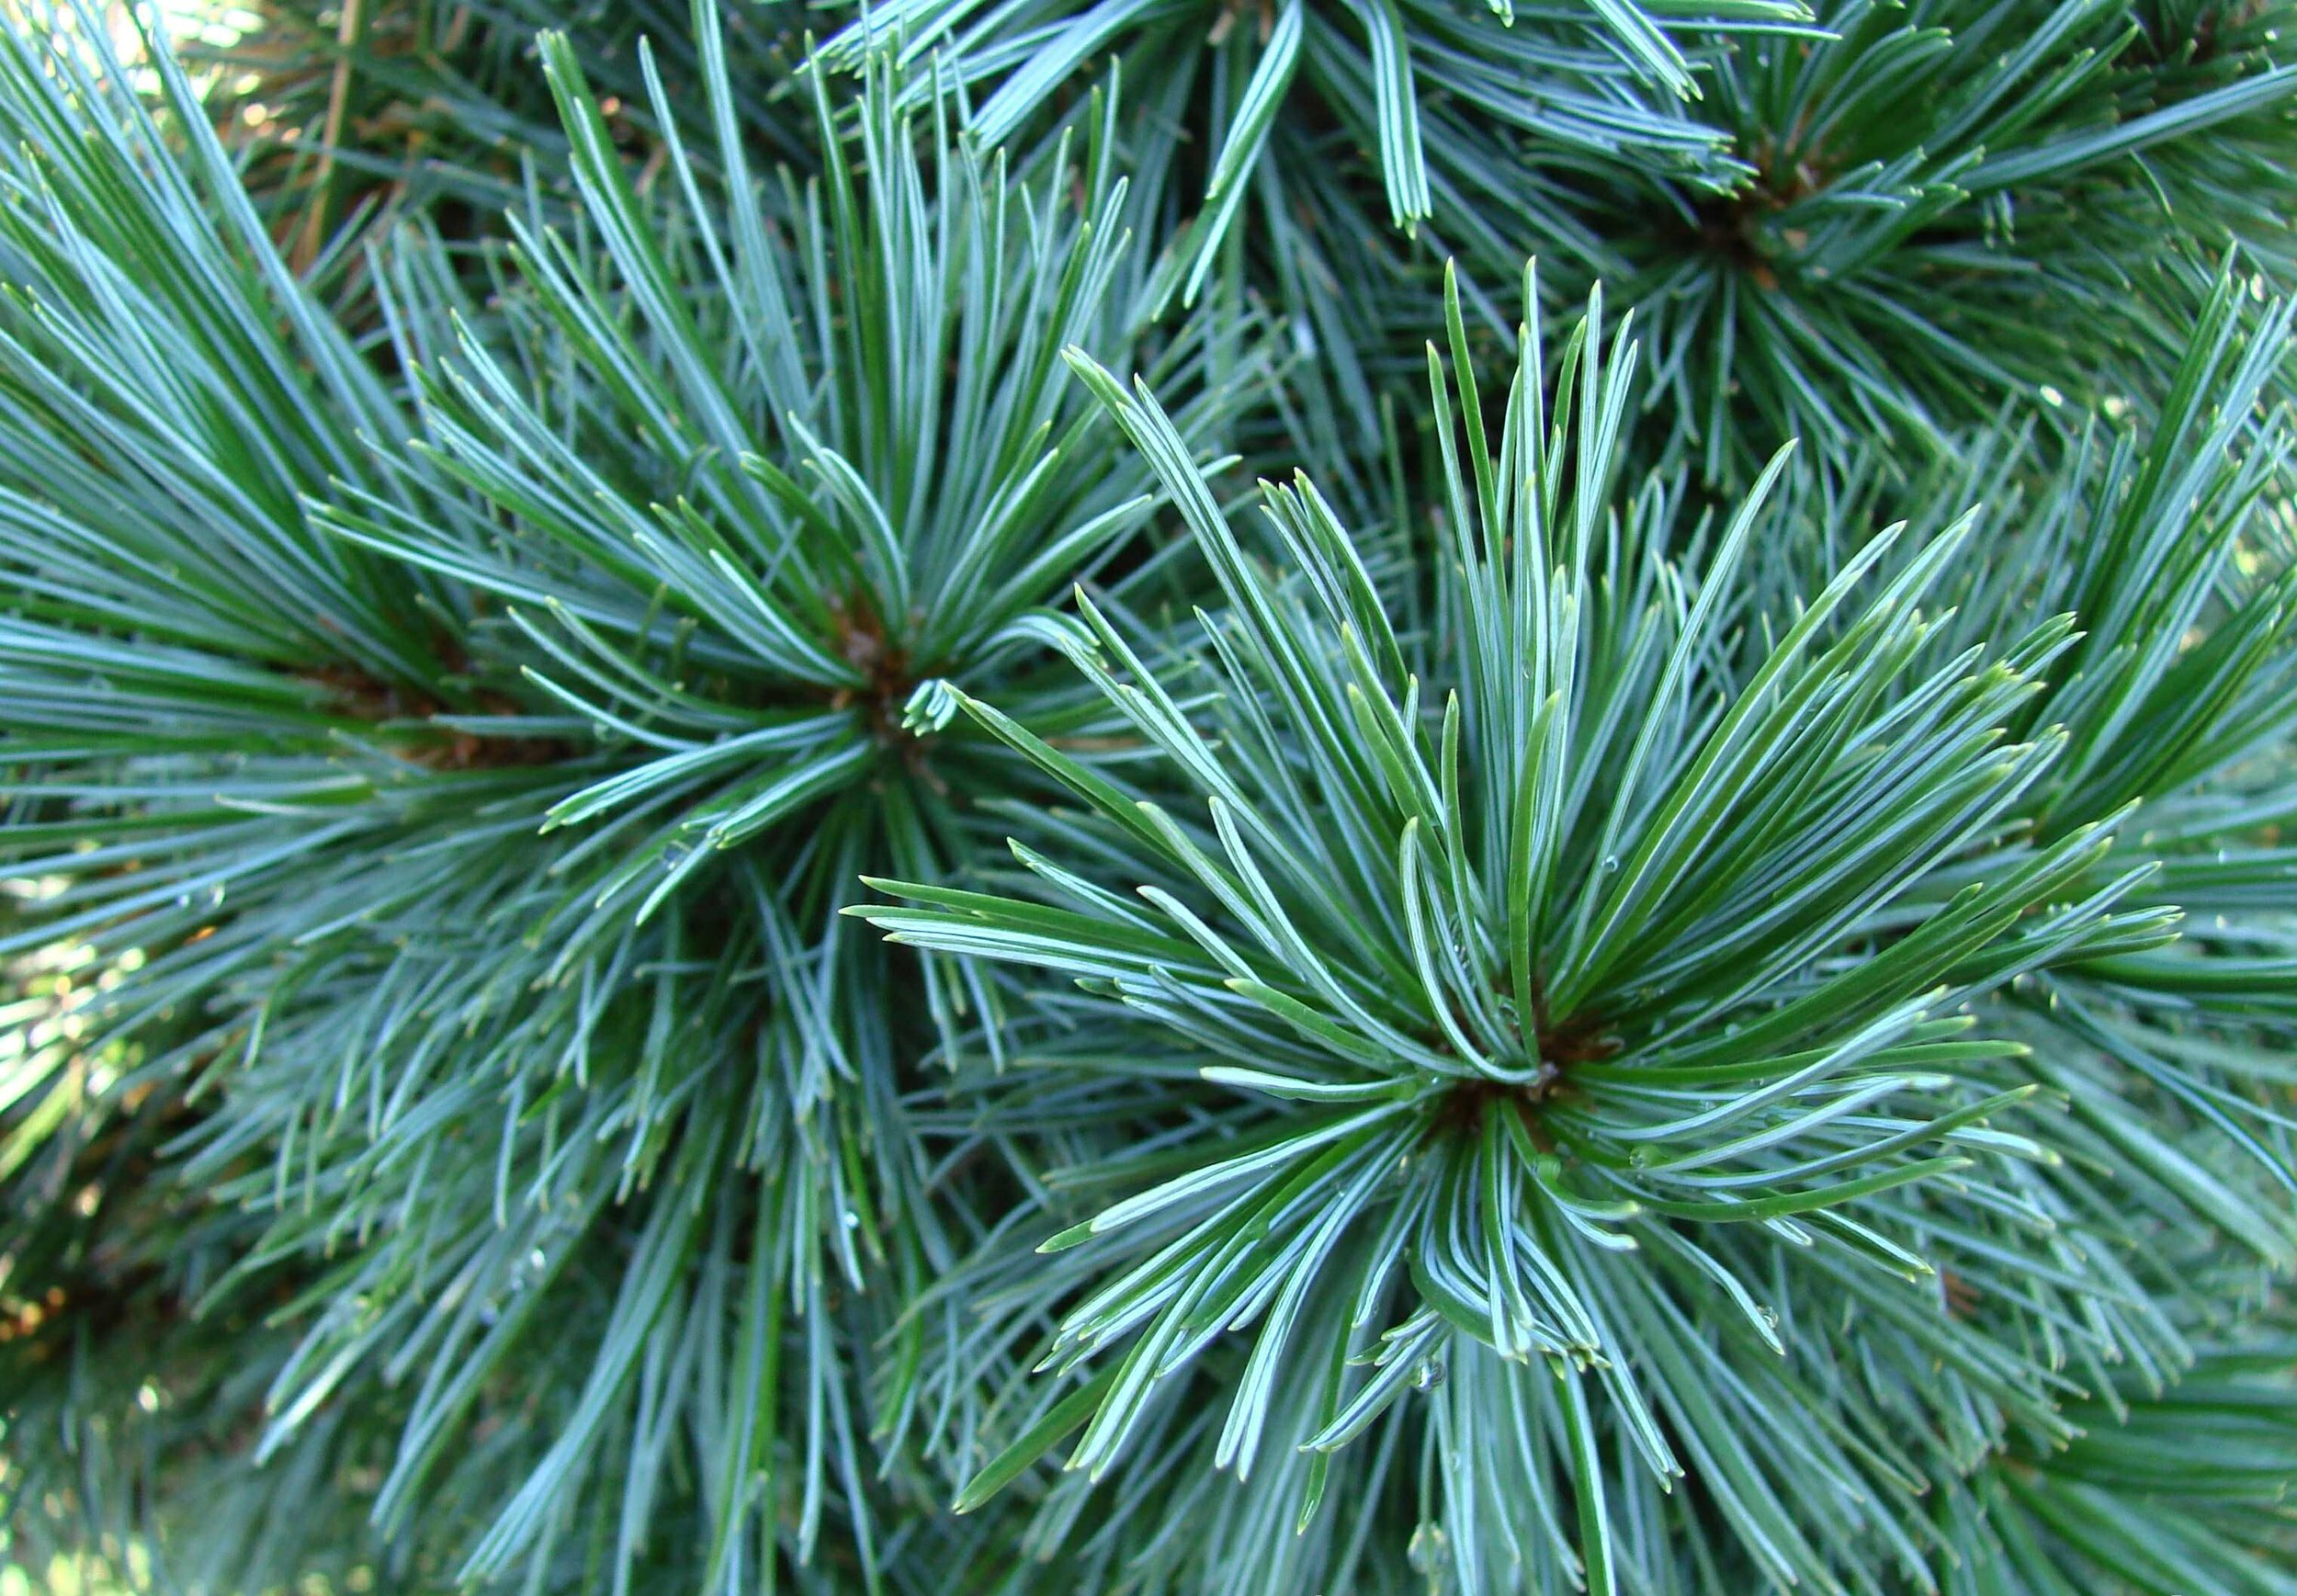 Pinus_flexi_Vanderwolf.jpg